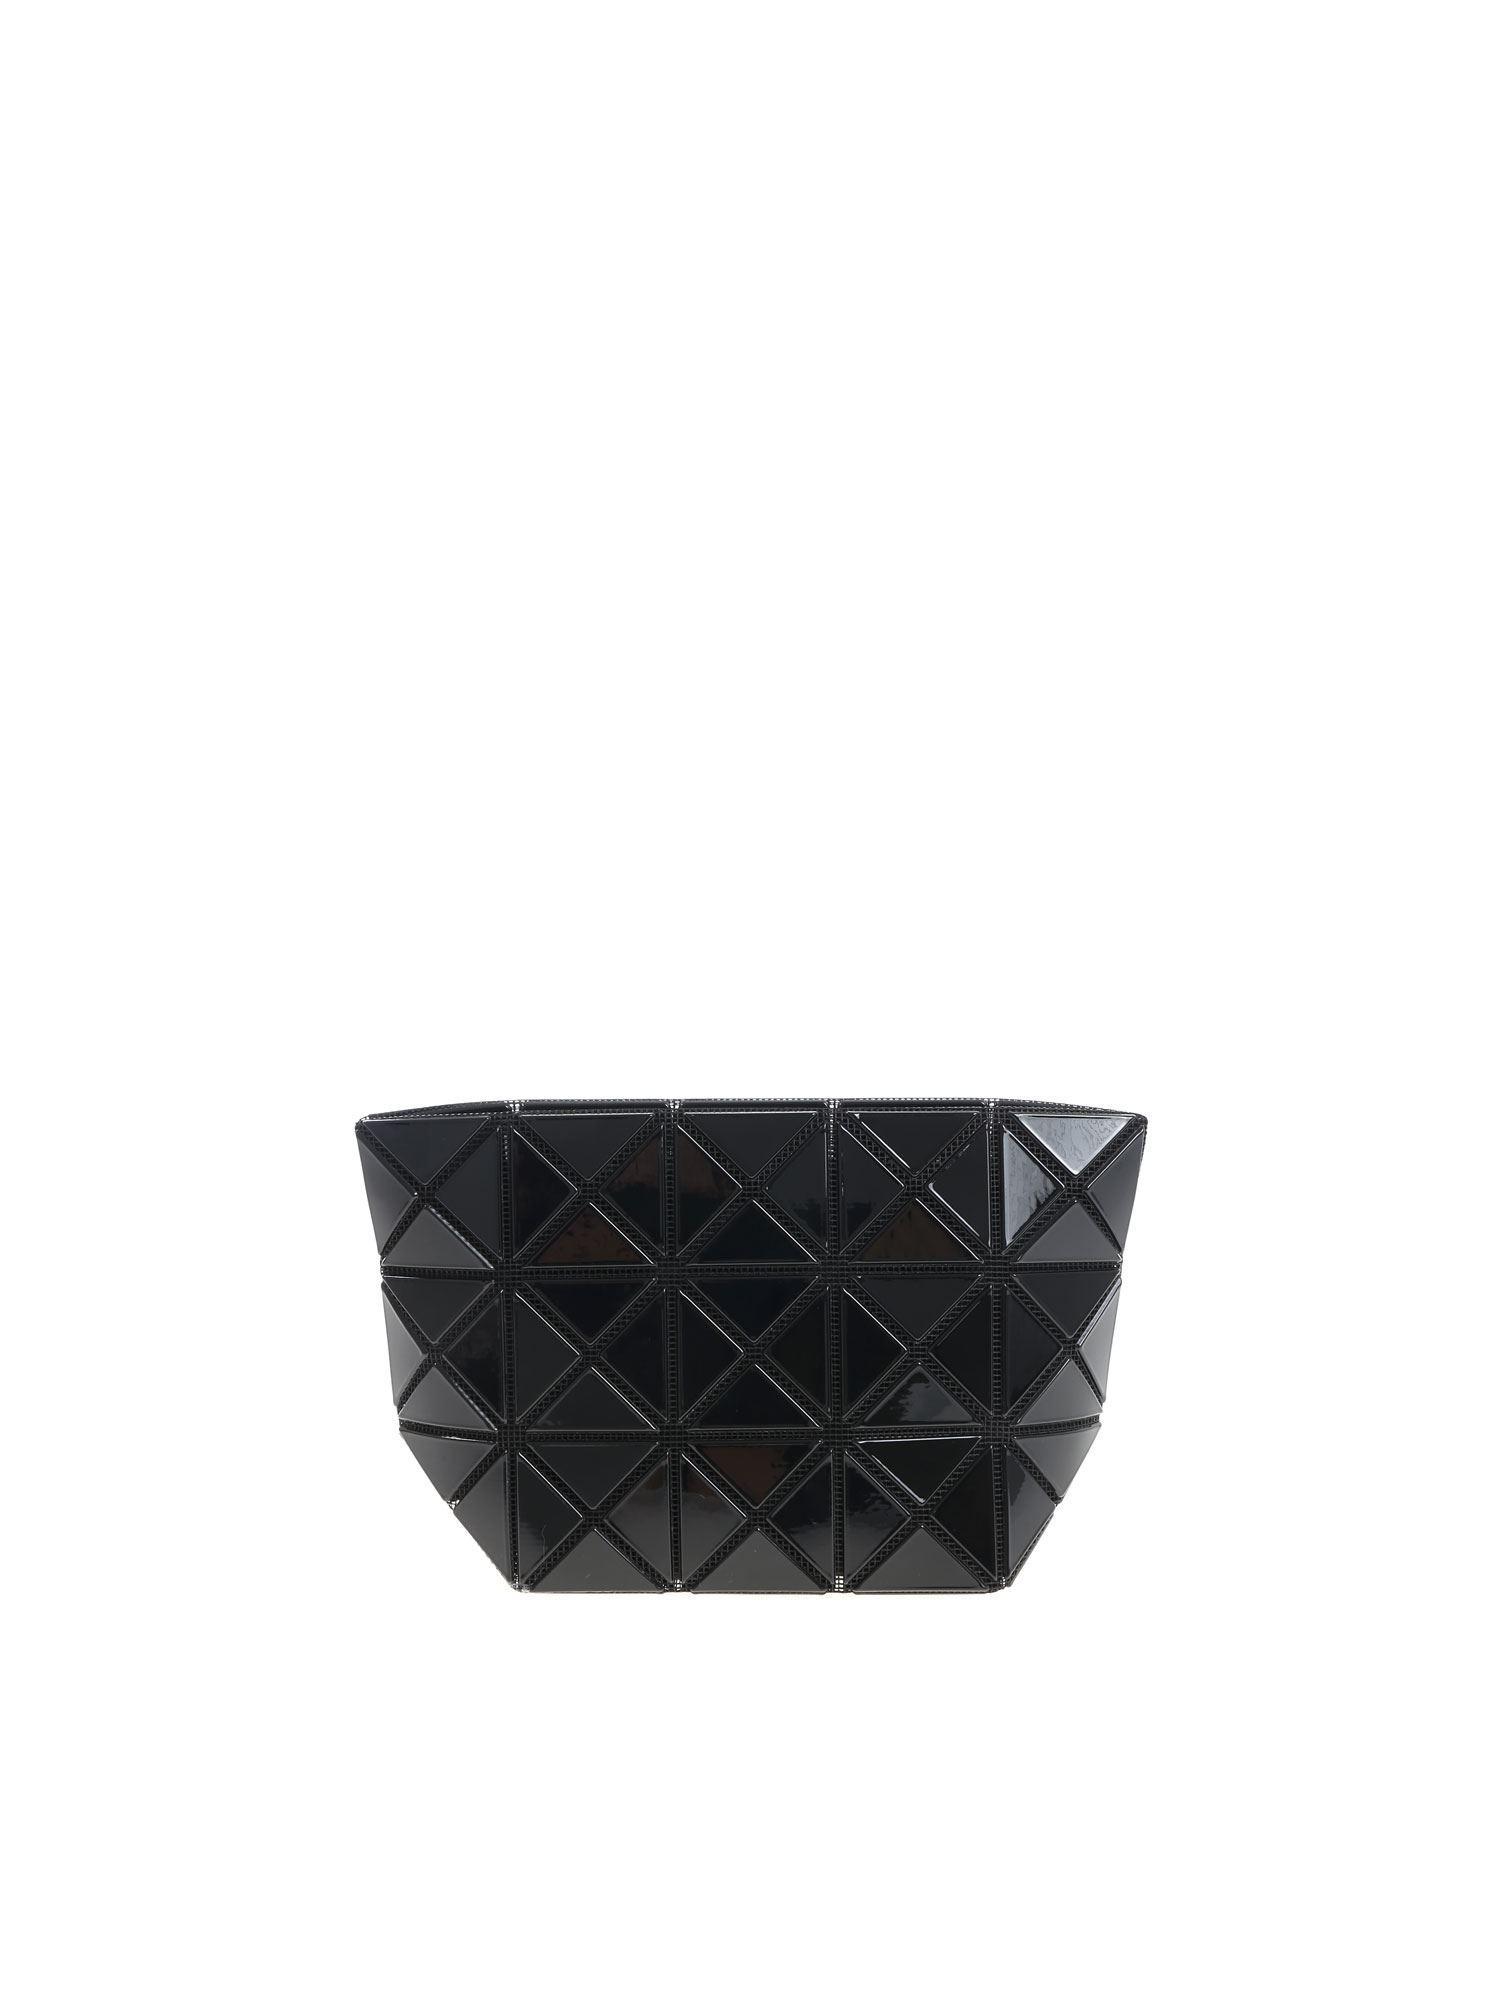 eea819343d64 Lyst - Bao Bao Issey Miyake Black Soft Purse in Black - Save 22%